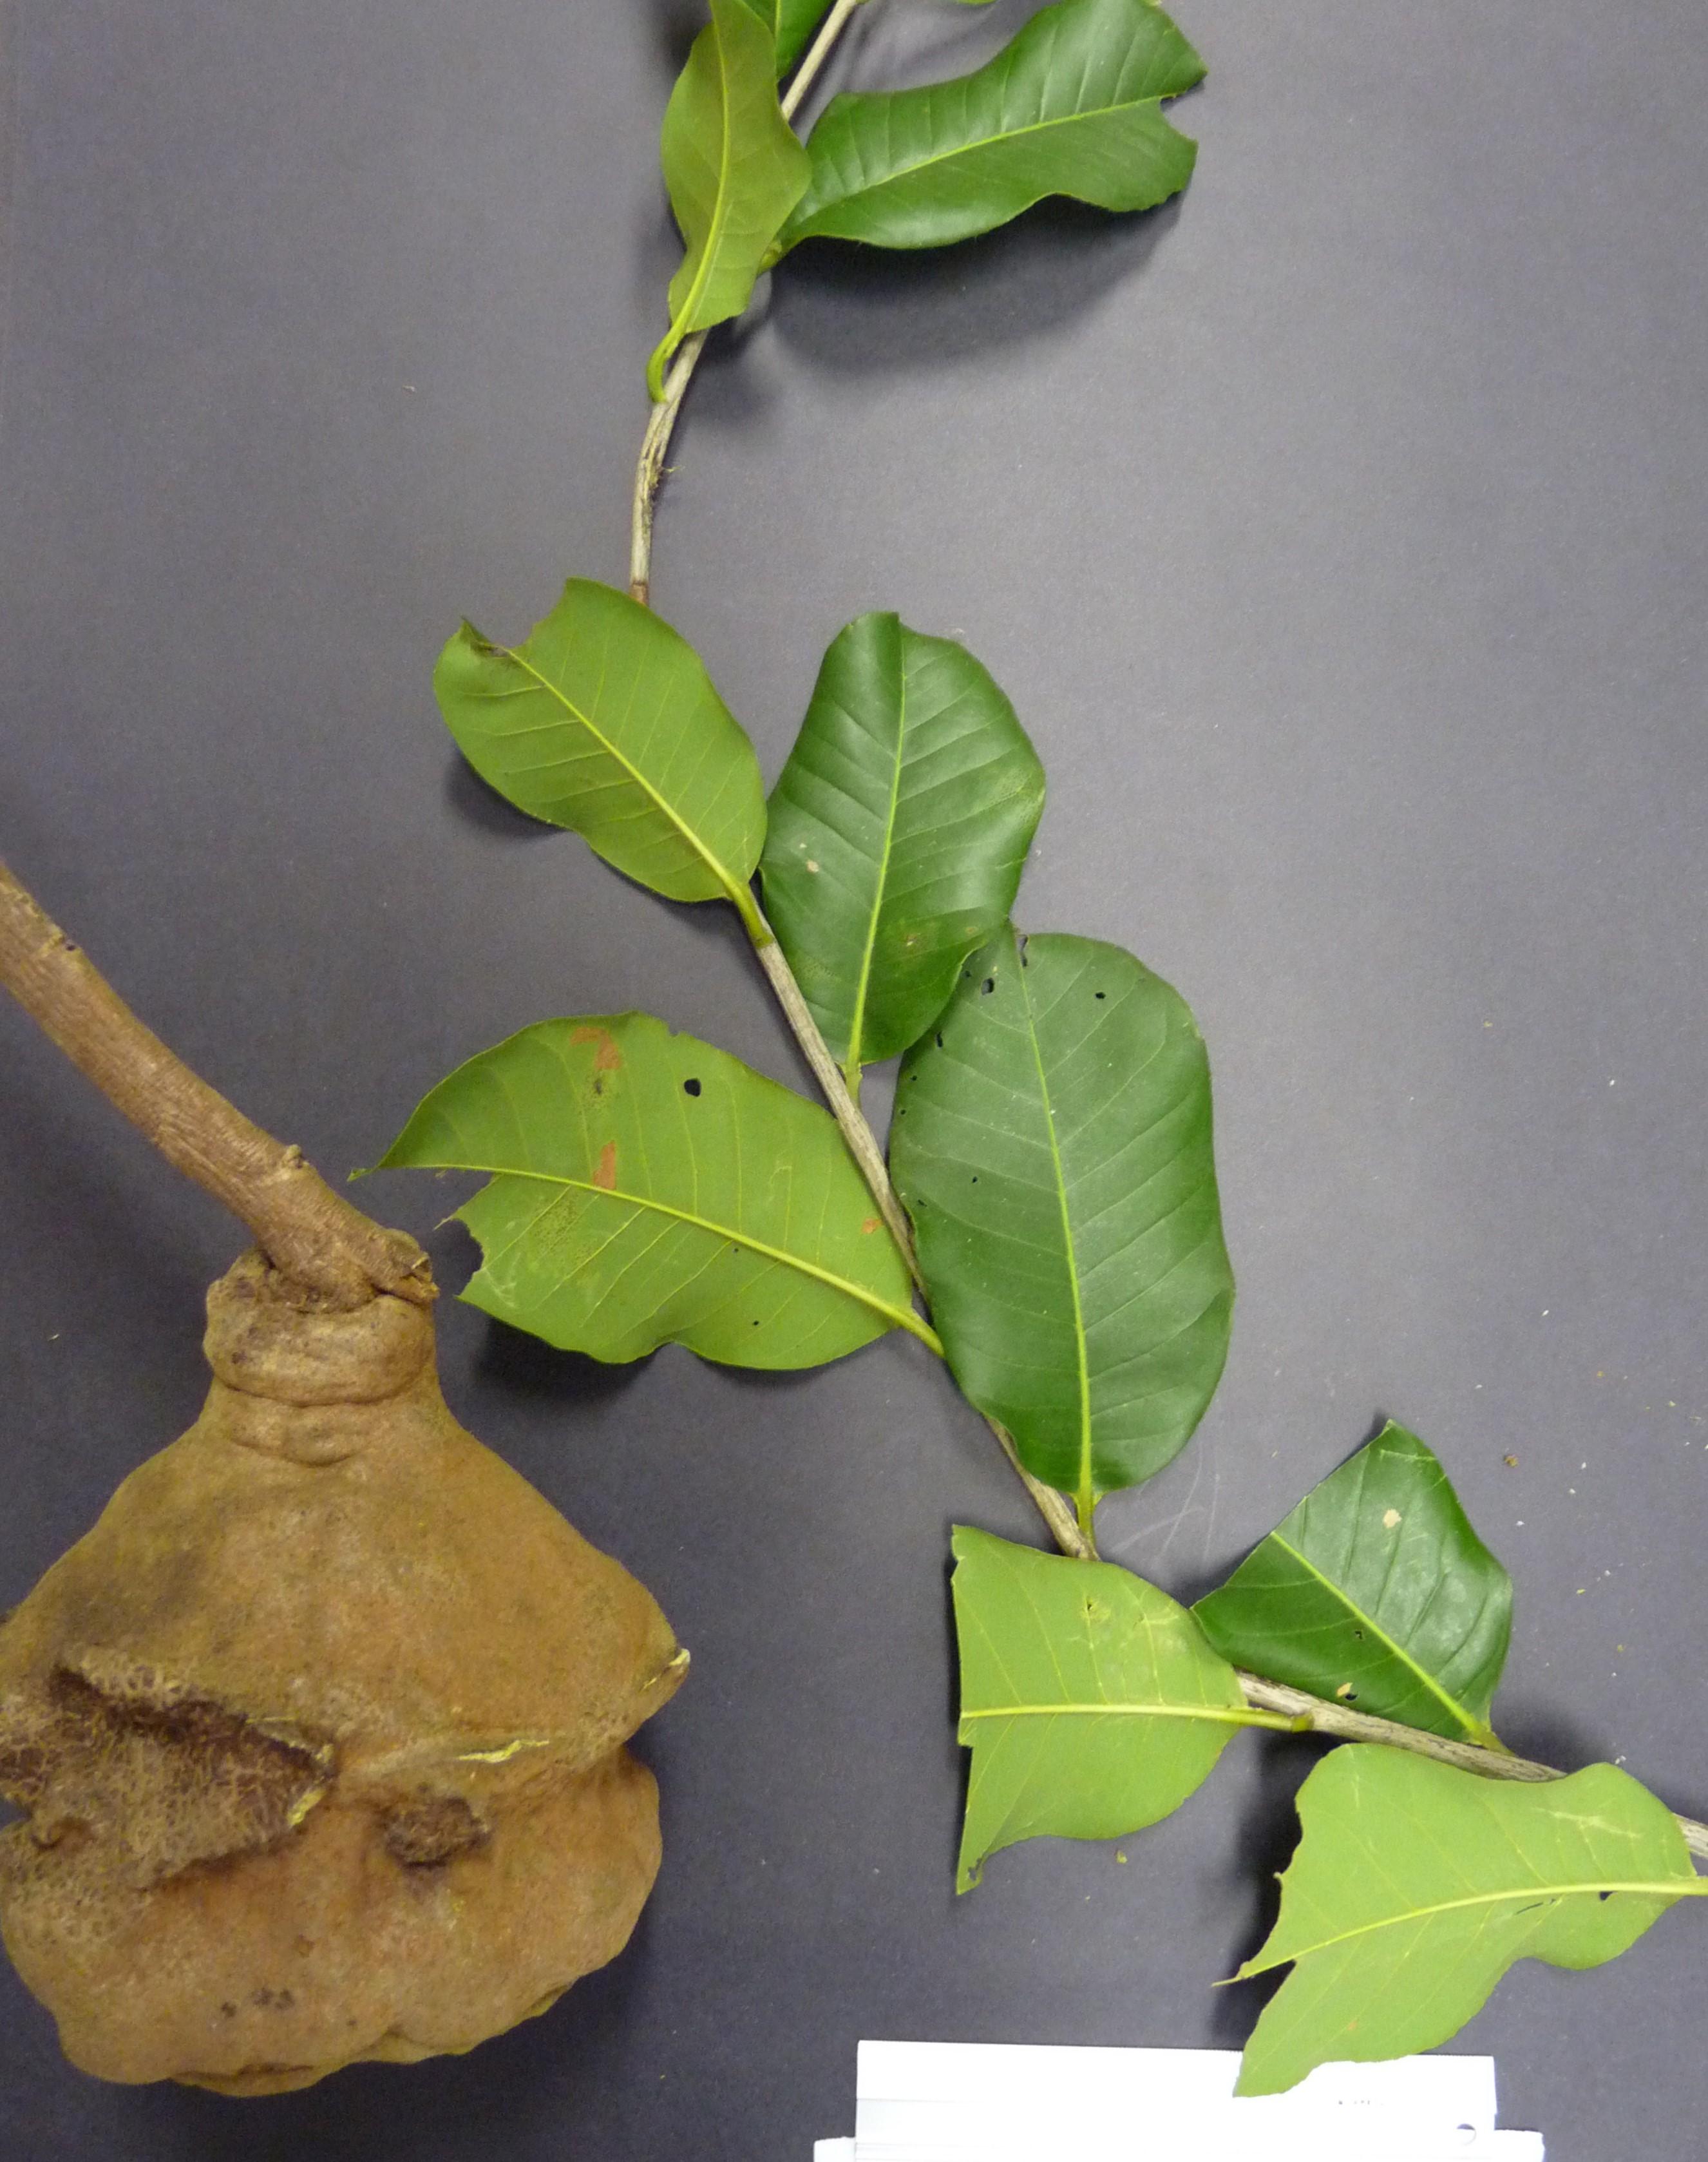 Specimen: Lecythis brancoensis